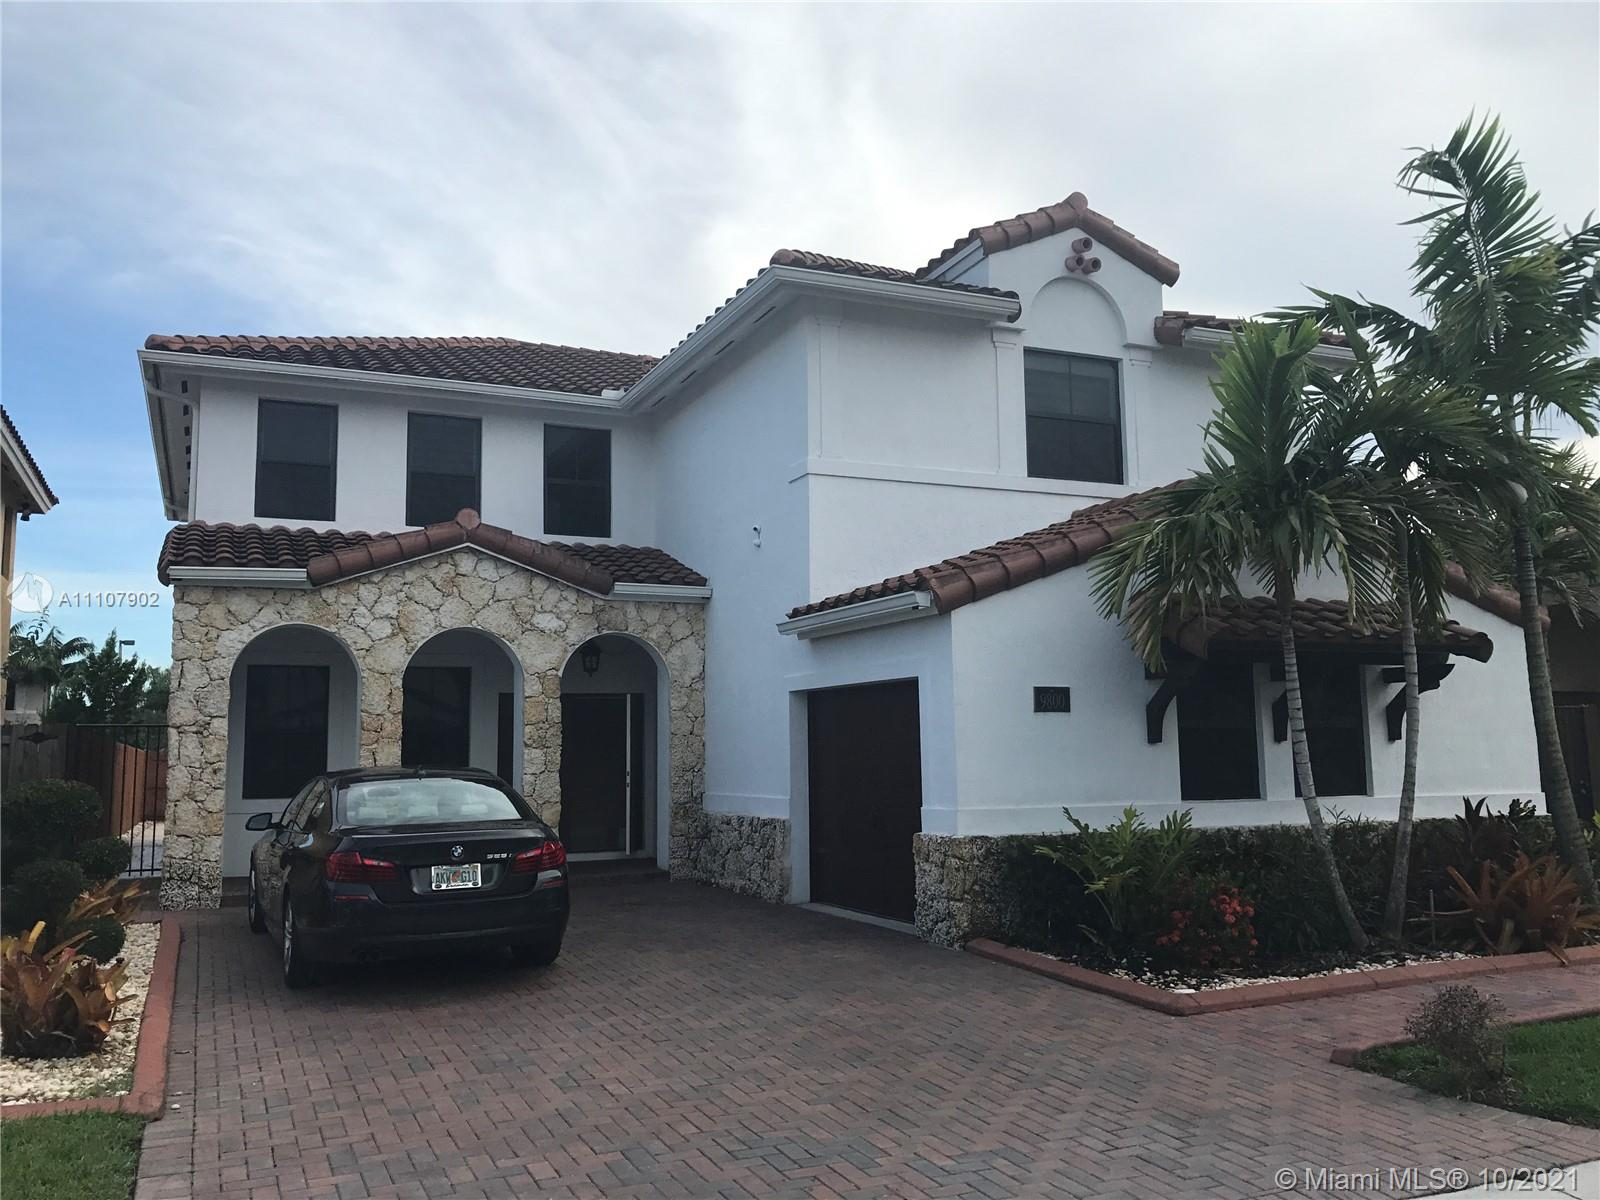 Las Ramblas - 9800 NW 10th Ter, Miami, FL 33172